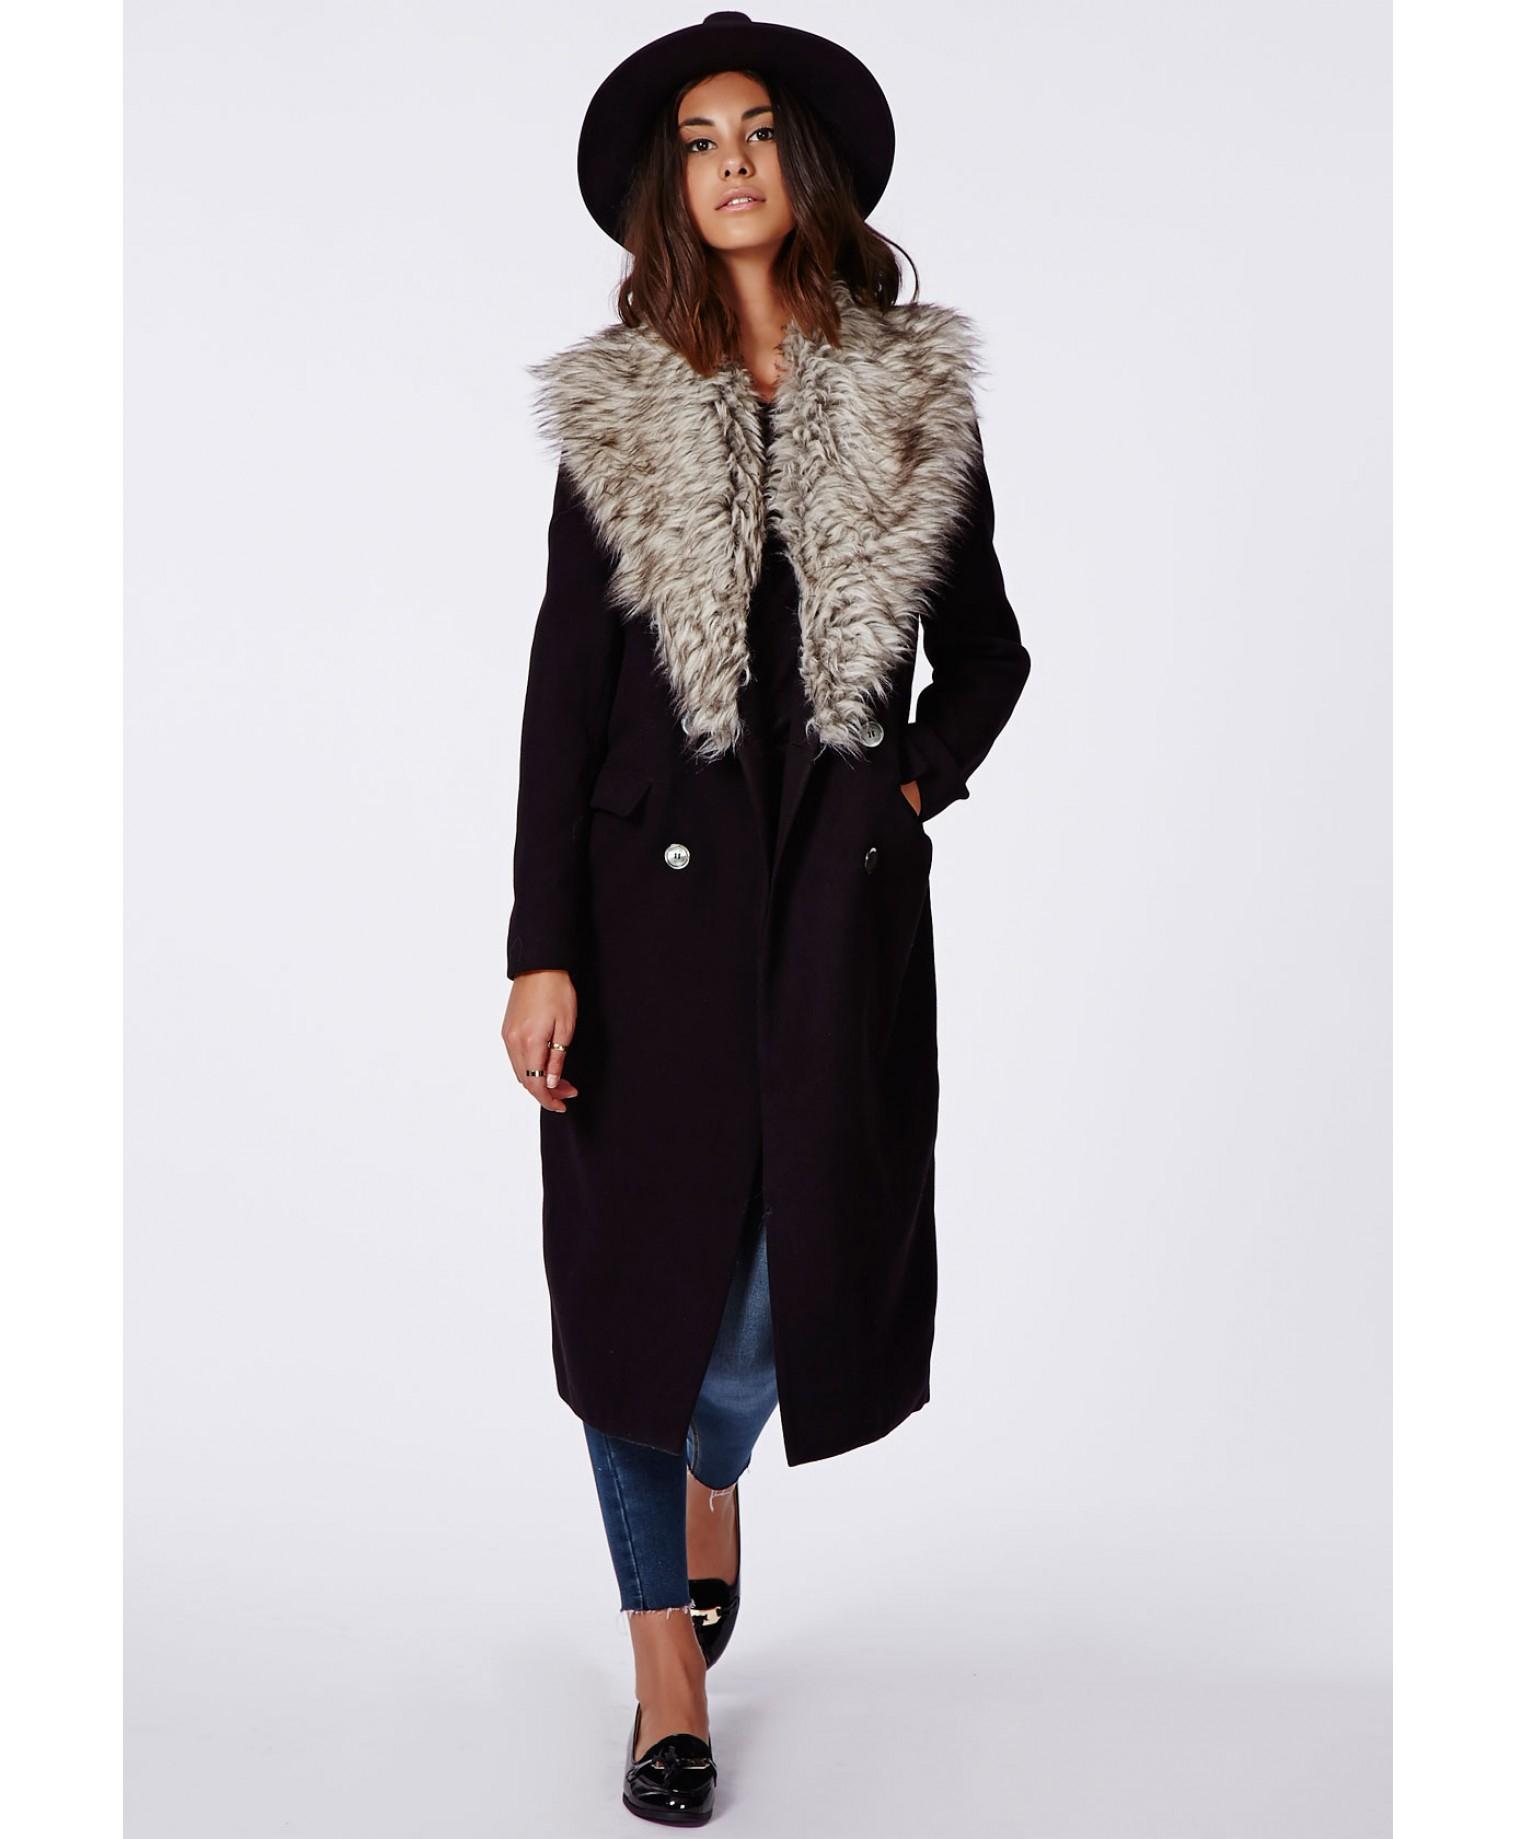 More Details Woolrich Literary Fur-Trim Cotton Parka Coat, Black Details Woolrich John Rich & Bros.